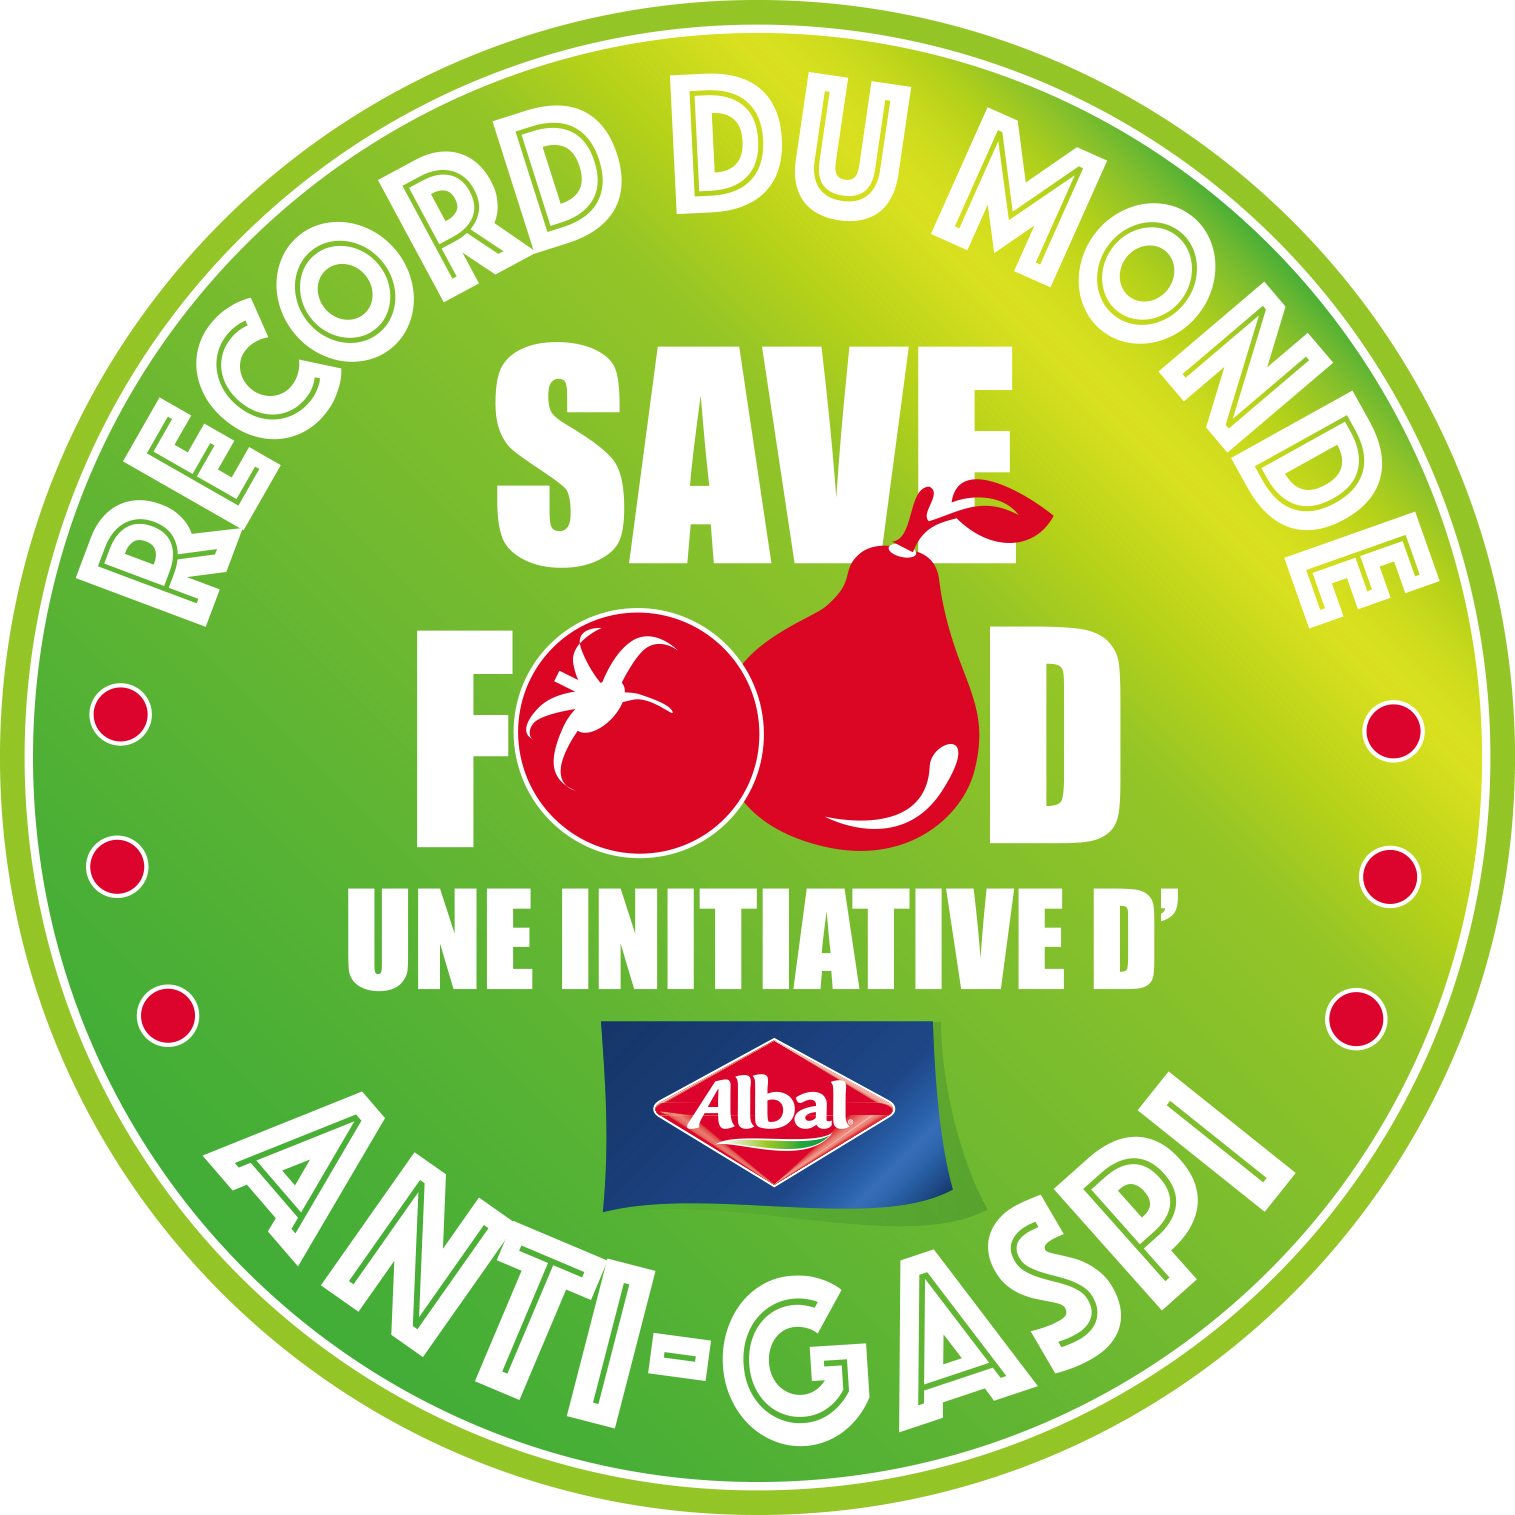 Record du monde anti-gaspi #savefood #zerowaste #zerogaspi